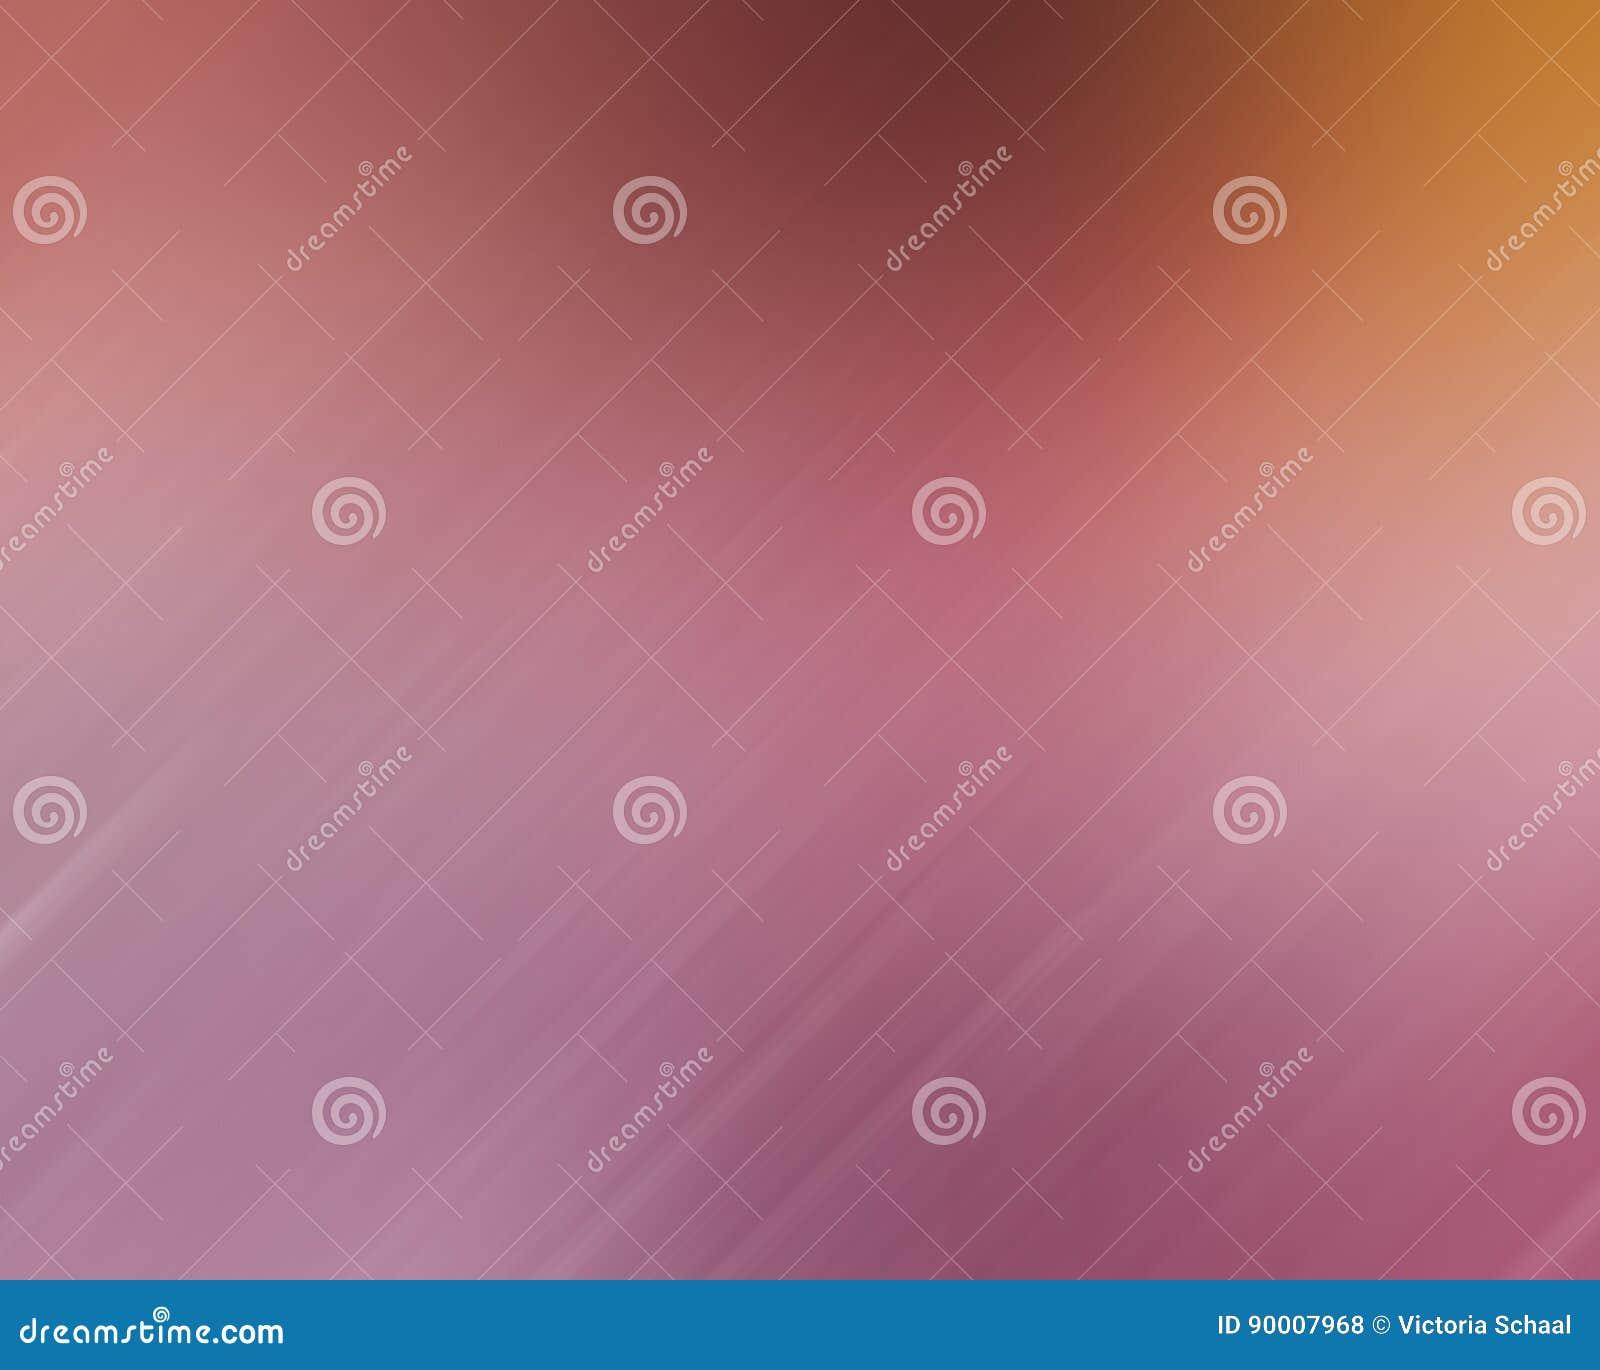 Professional Background Purple To Orange Stock Illustration